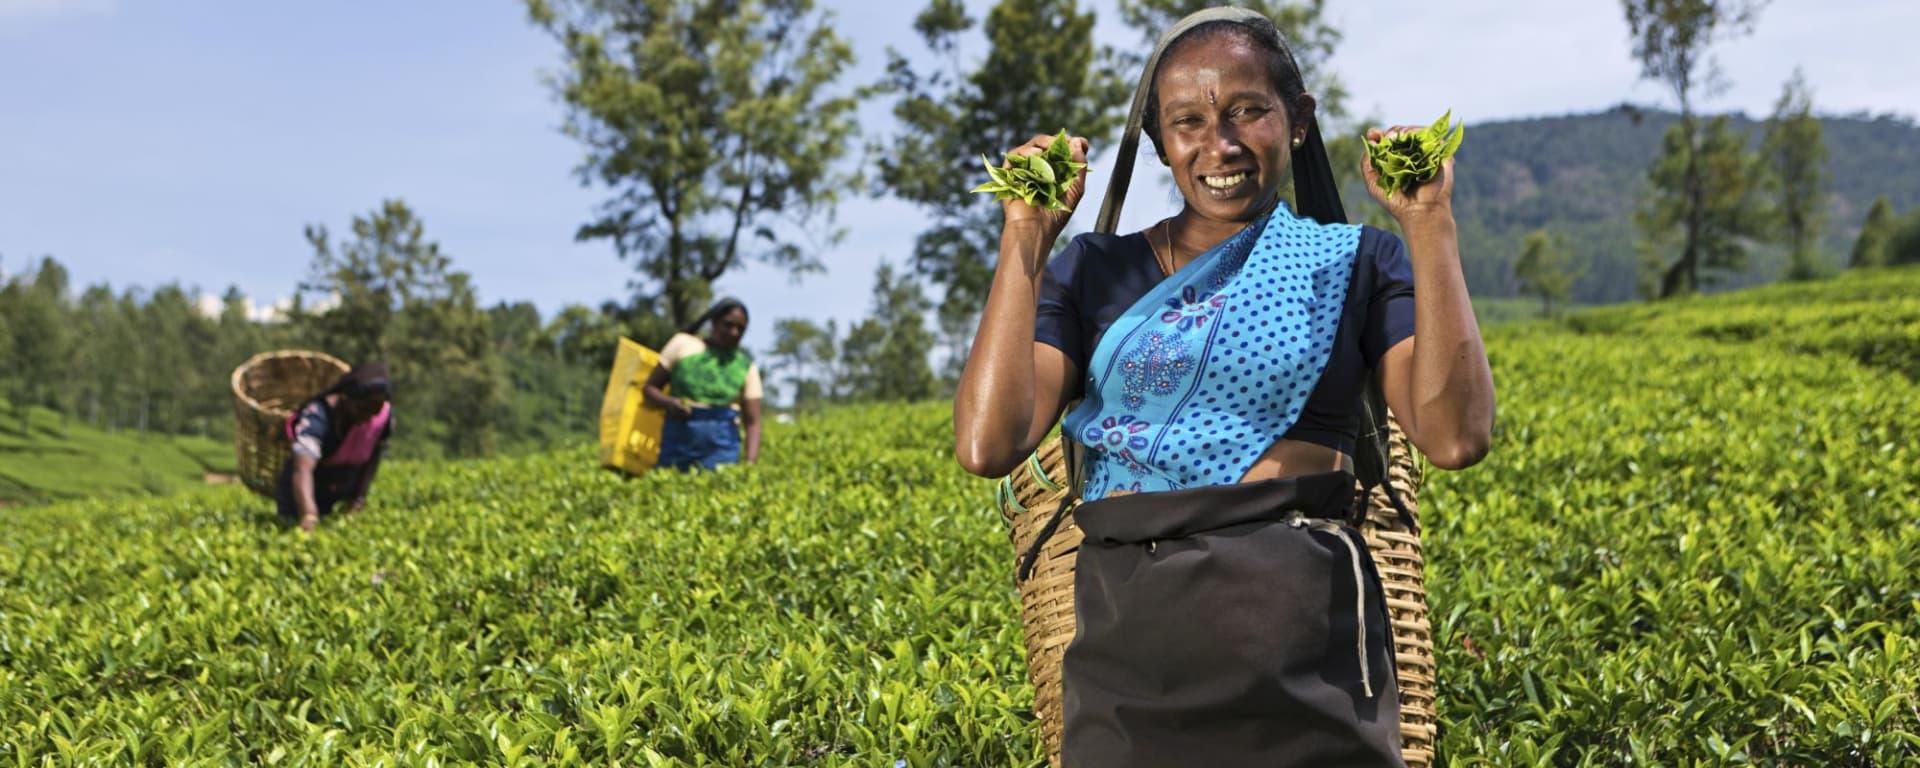 Le Sri Lanka pour les fins connaisseurs de Colombo: Nuwara Eliya Tea plucking women